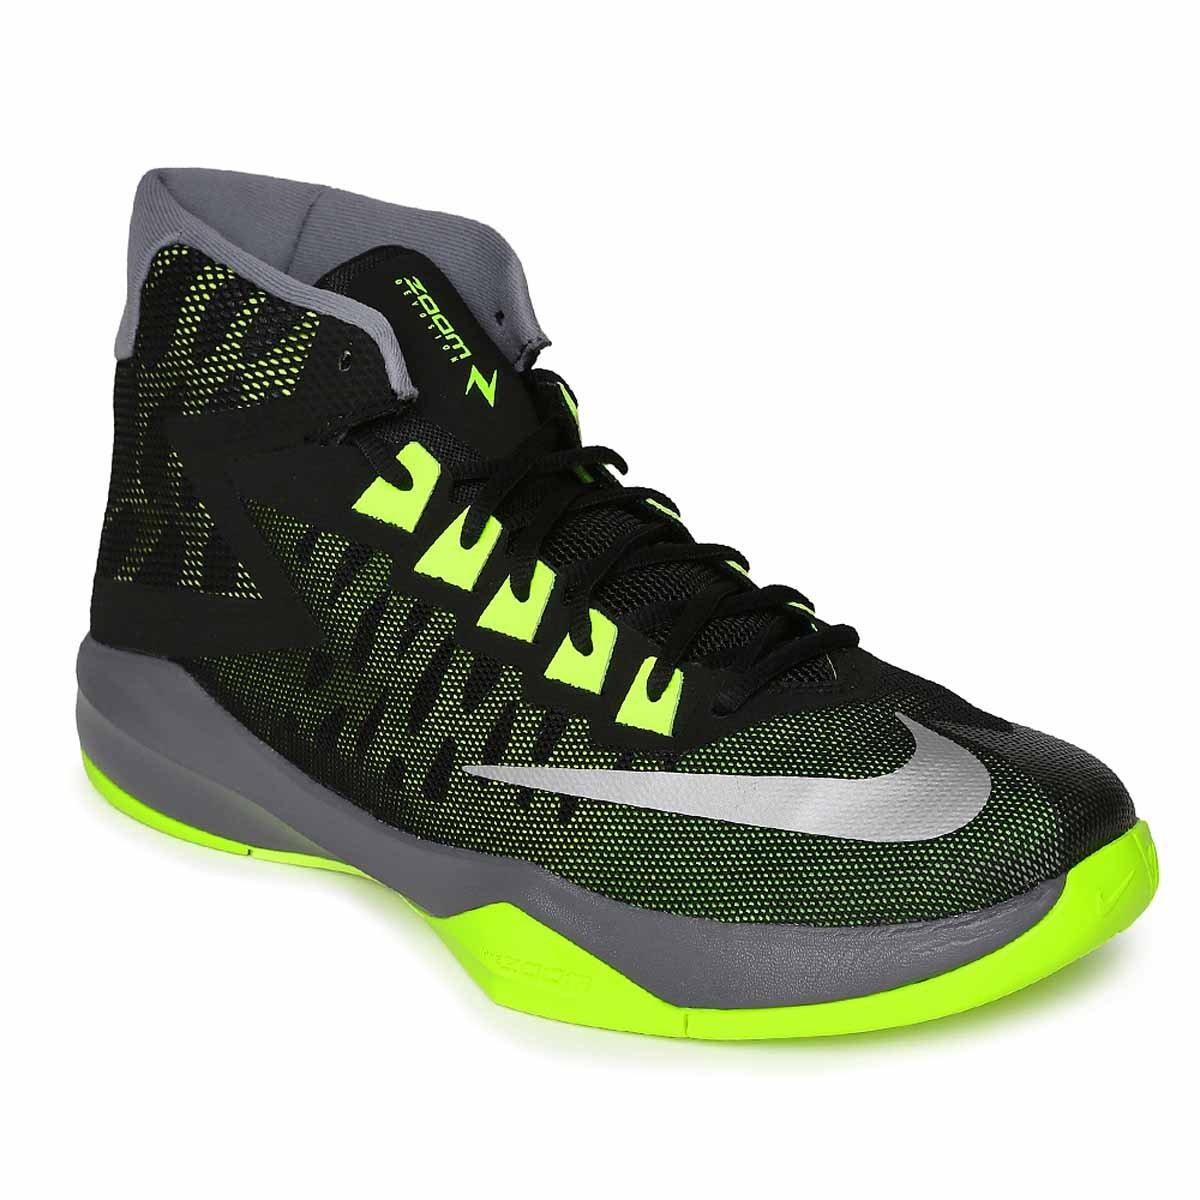 Buy Nike Zoom Devosion Basketball Shoes